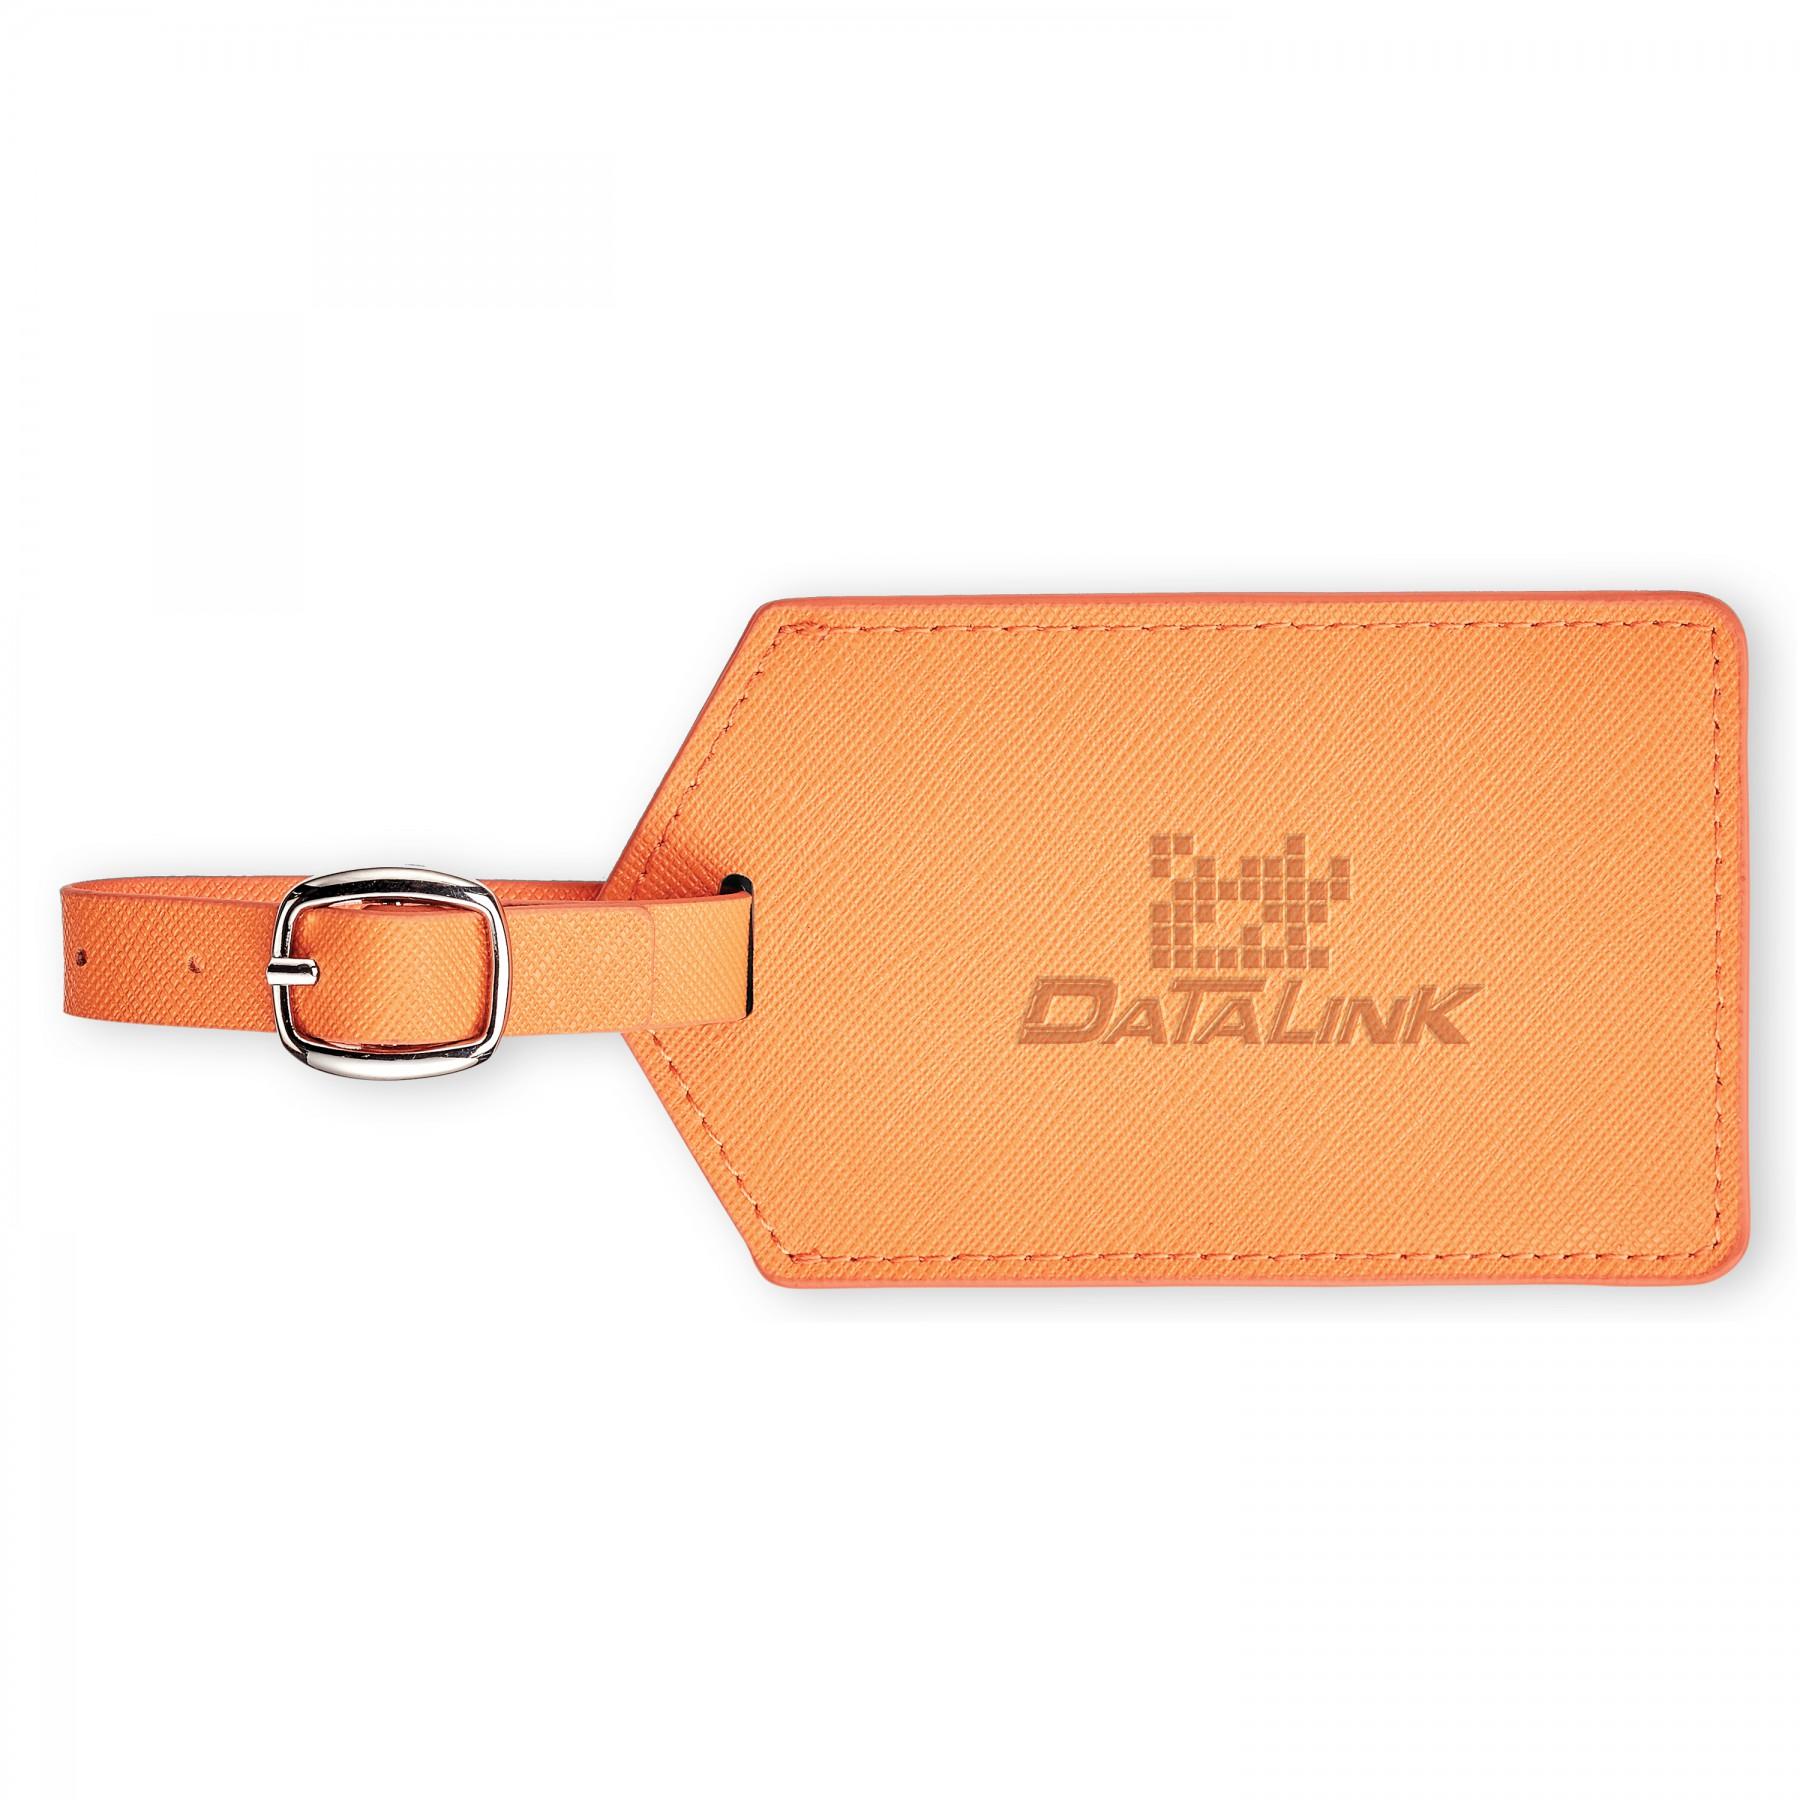 Toscano Genuine Leather Luggage Tag - Debossed Imprint (G528)